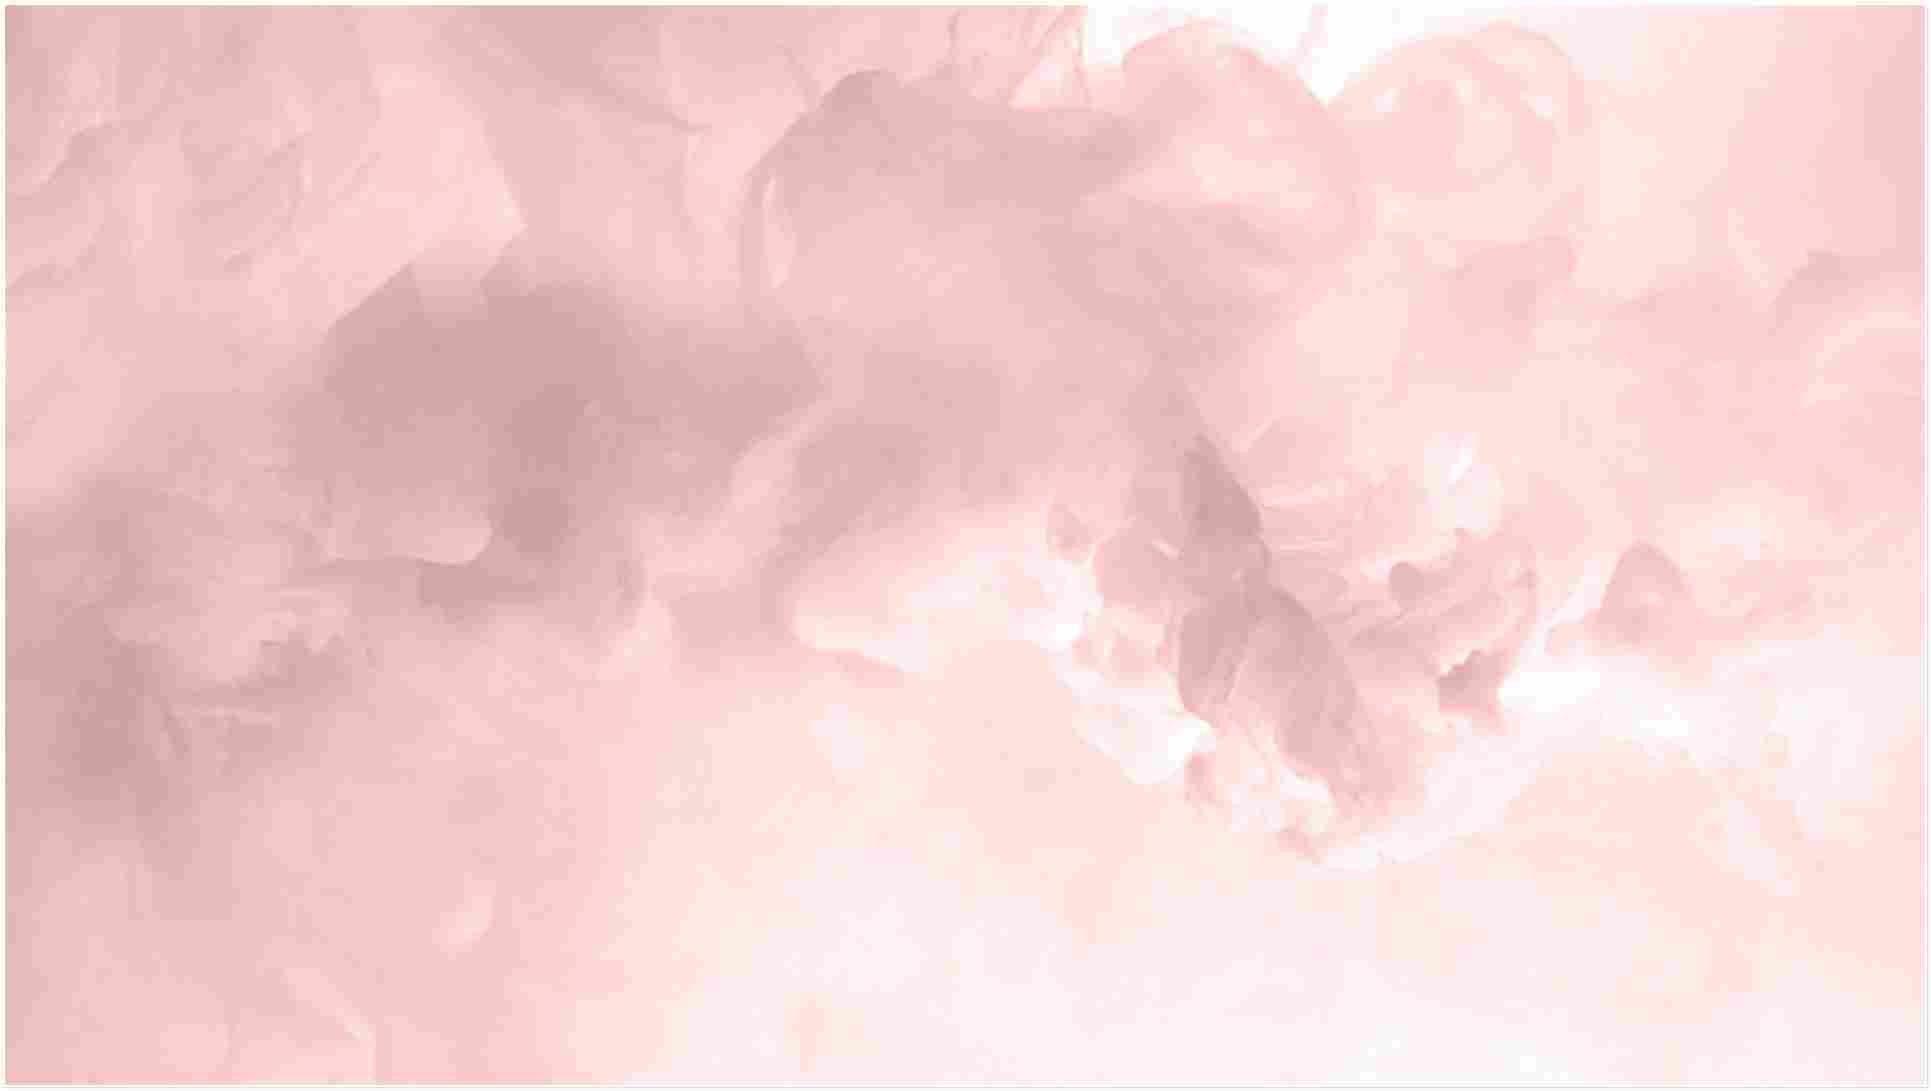 Awesome Marble Desktop Wallpaper Download Free Our Rose Gold Wallpaper Desktop 2840269 Hd Wallpaper Backgrounds Download